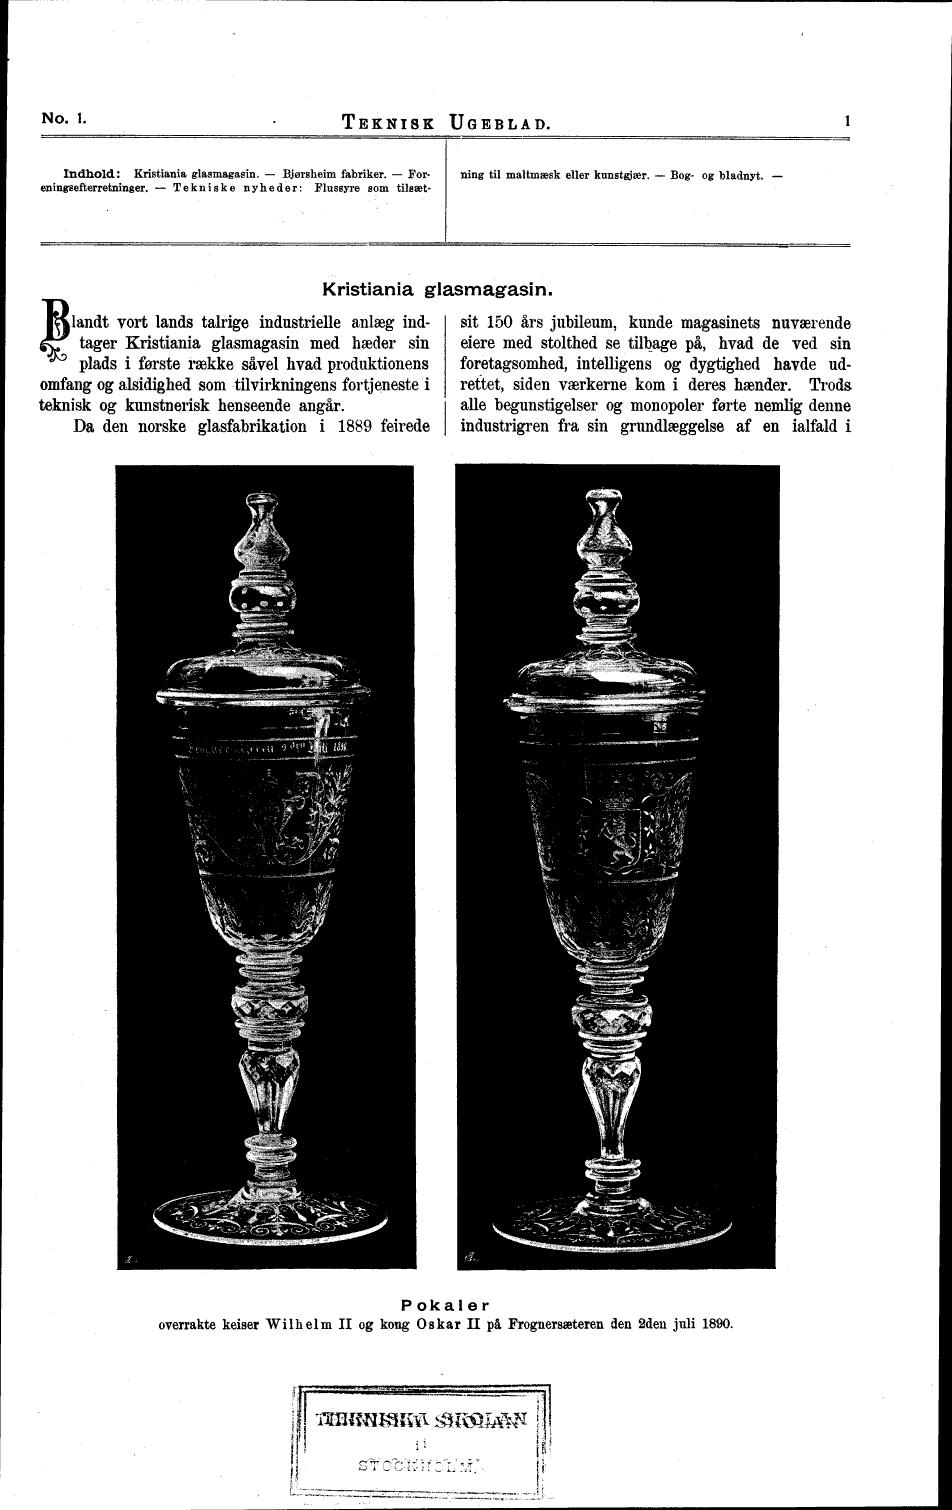 Kristiania glassmagasin